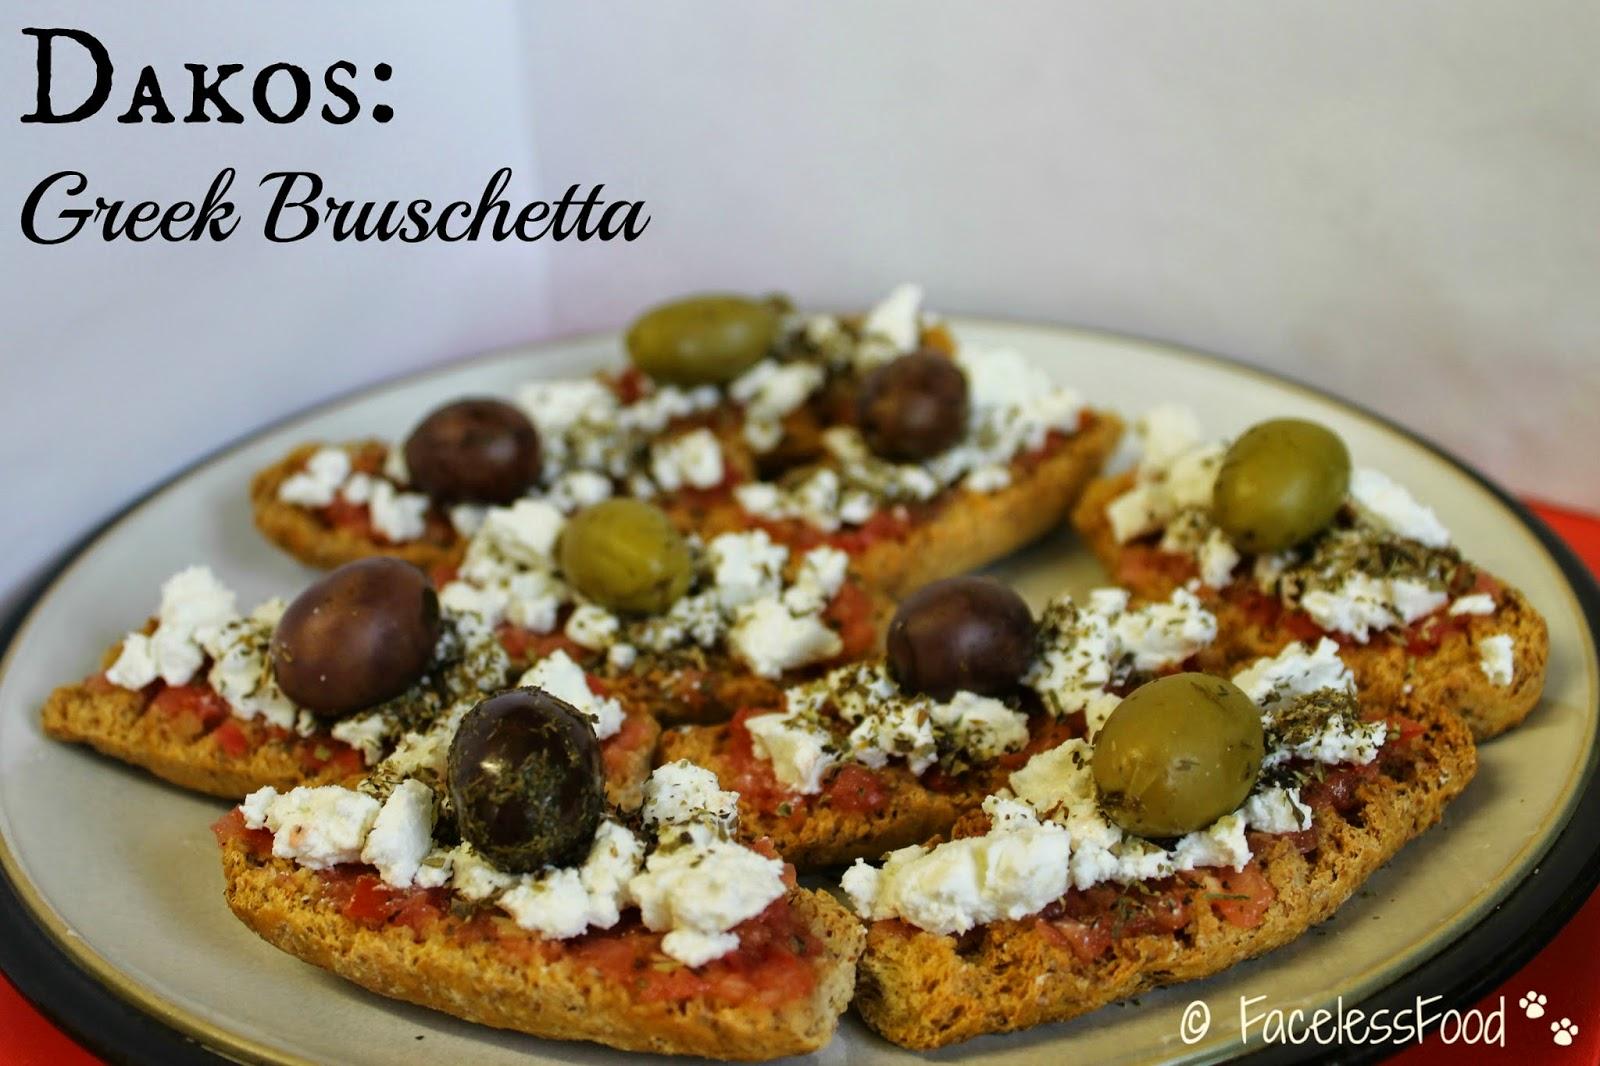 Dakos - Greek bruschetta